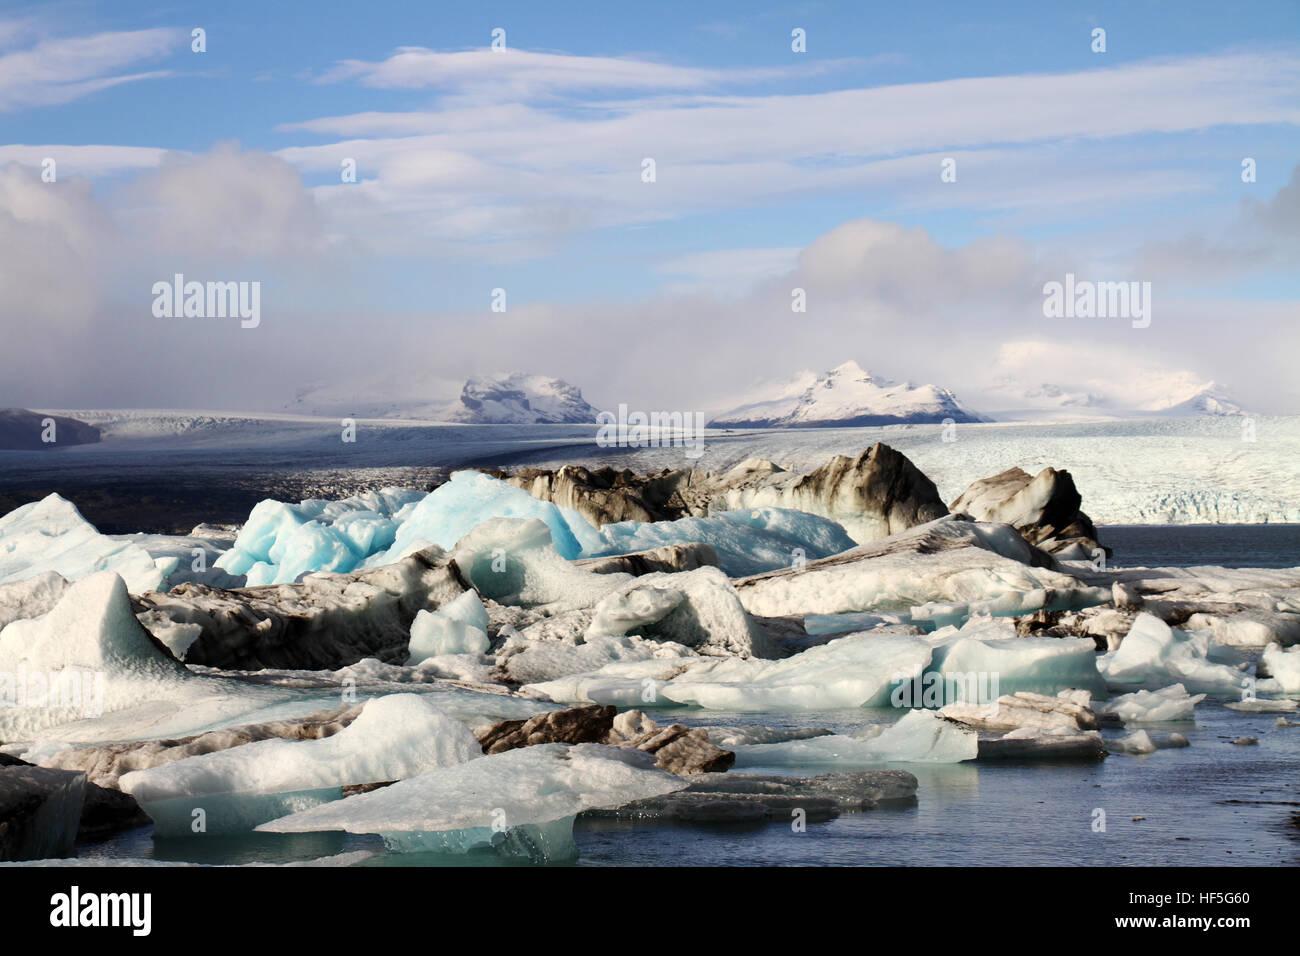 Bergs glace Ice Cap glacier iceberg Islande Photo Stock